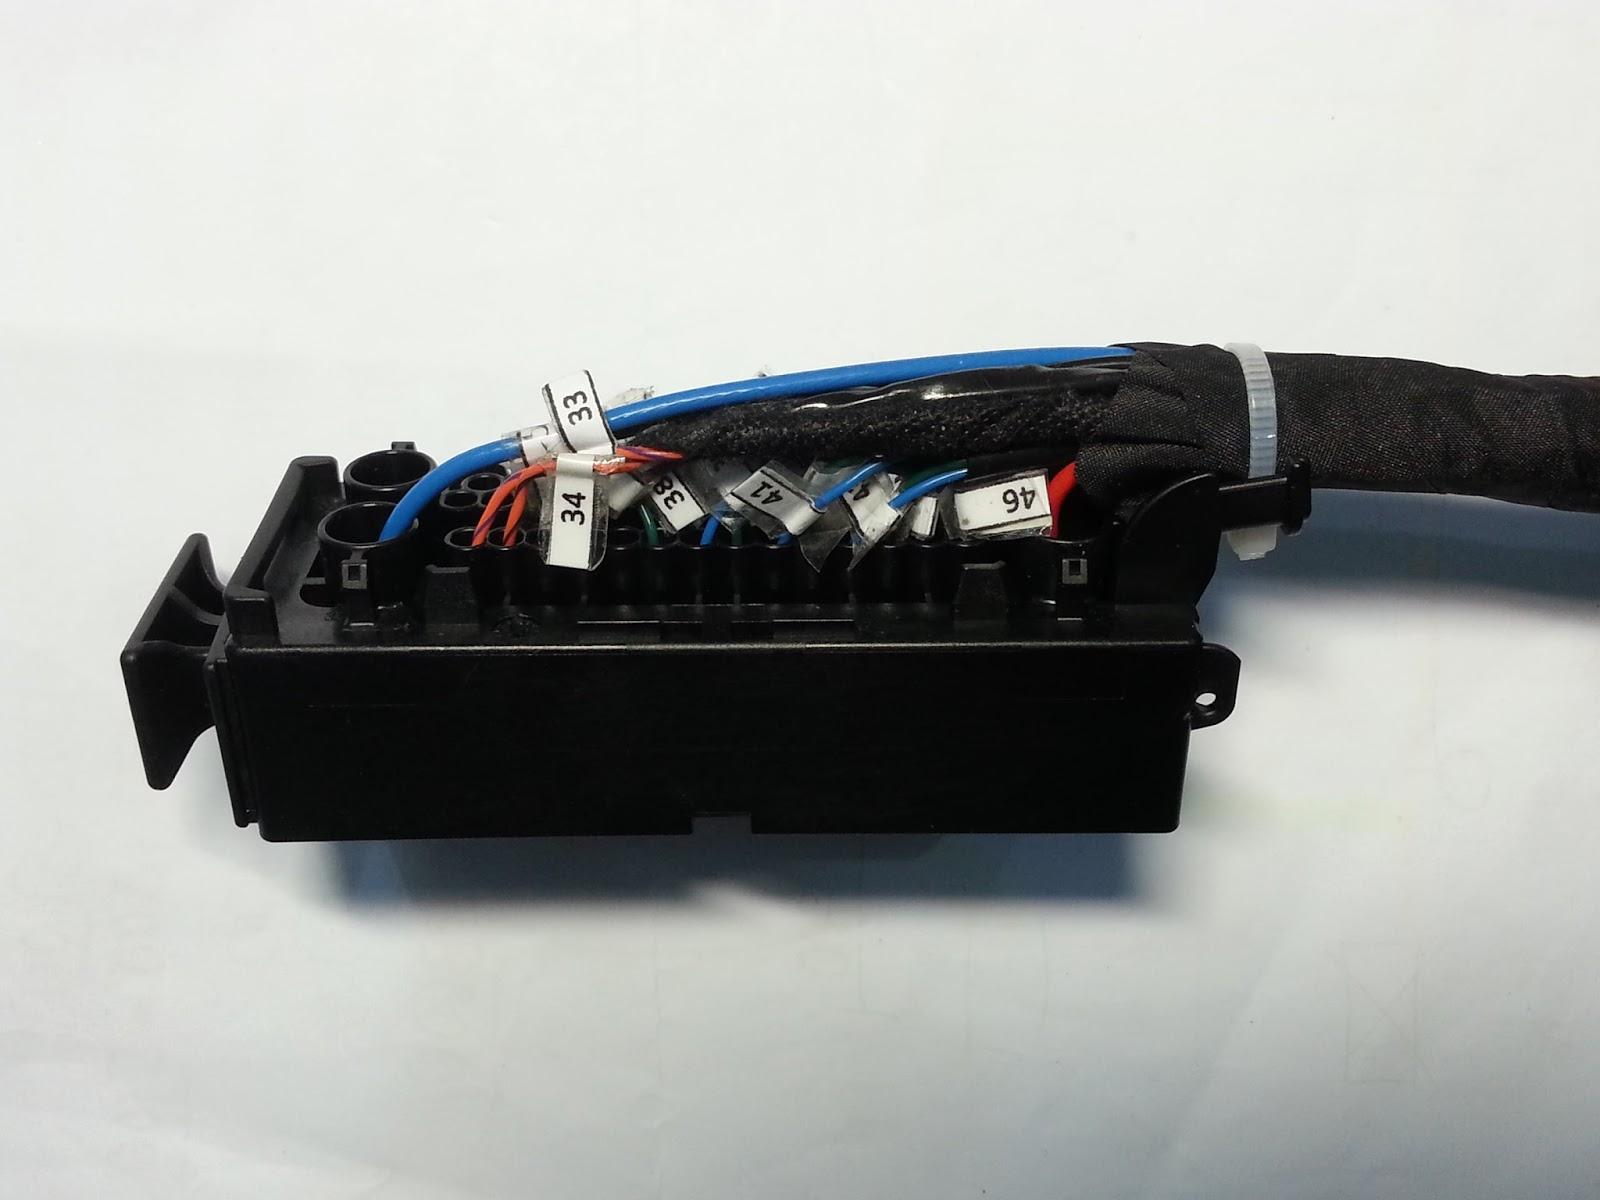 Cbx Rns510  U0026 Accessories  Passat B6 Dynamic Chassis